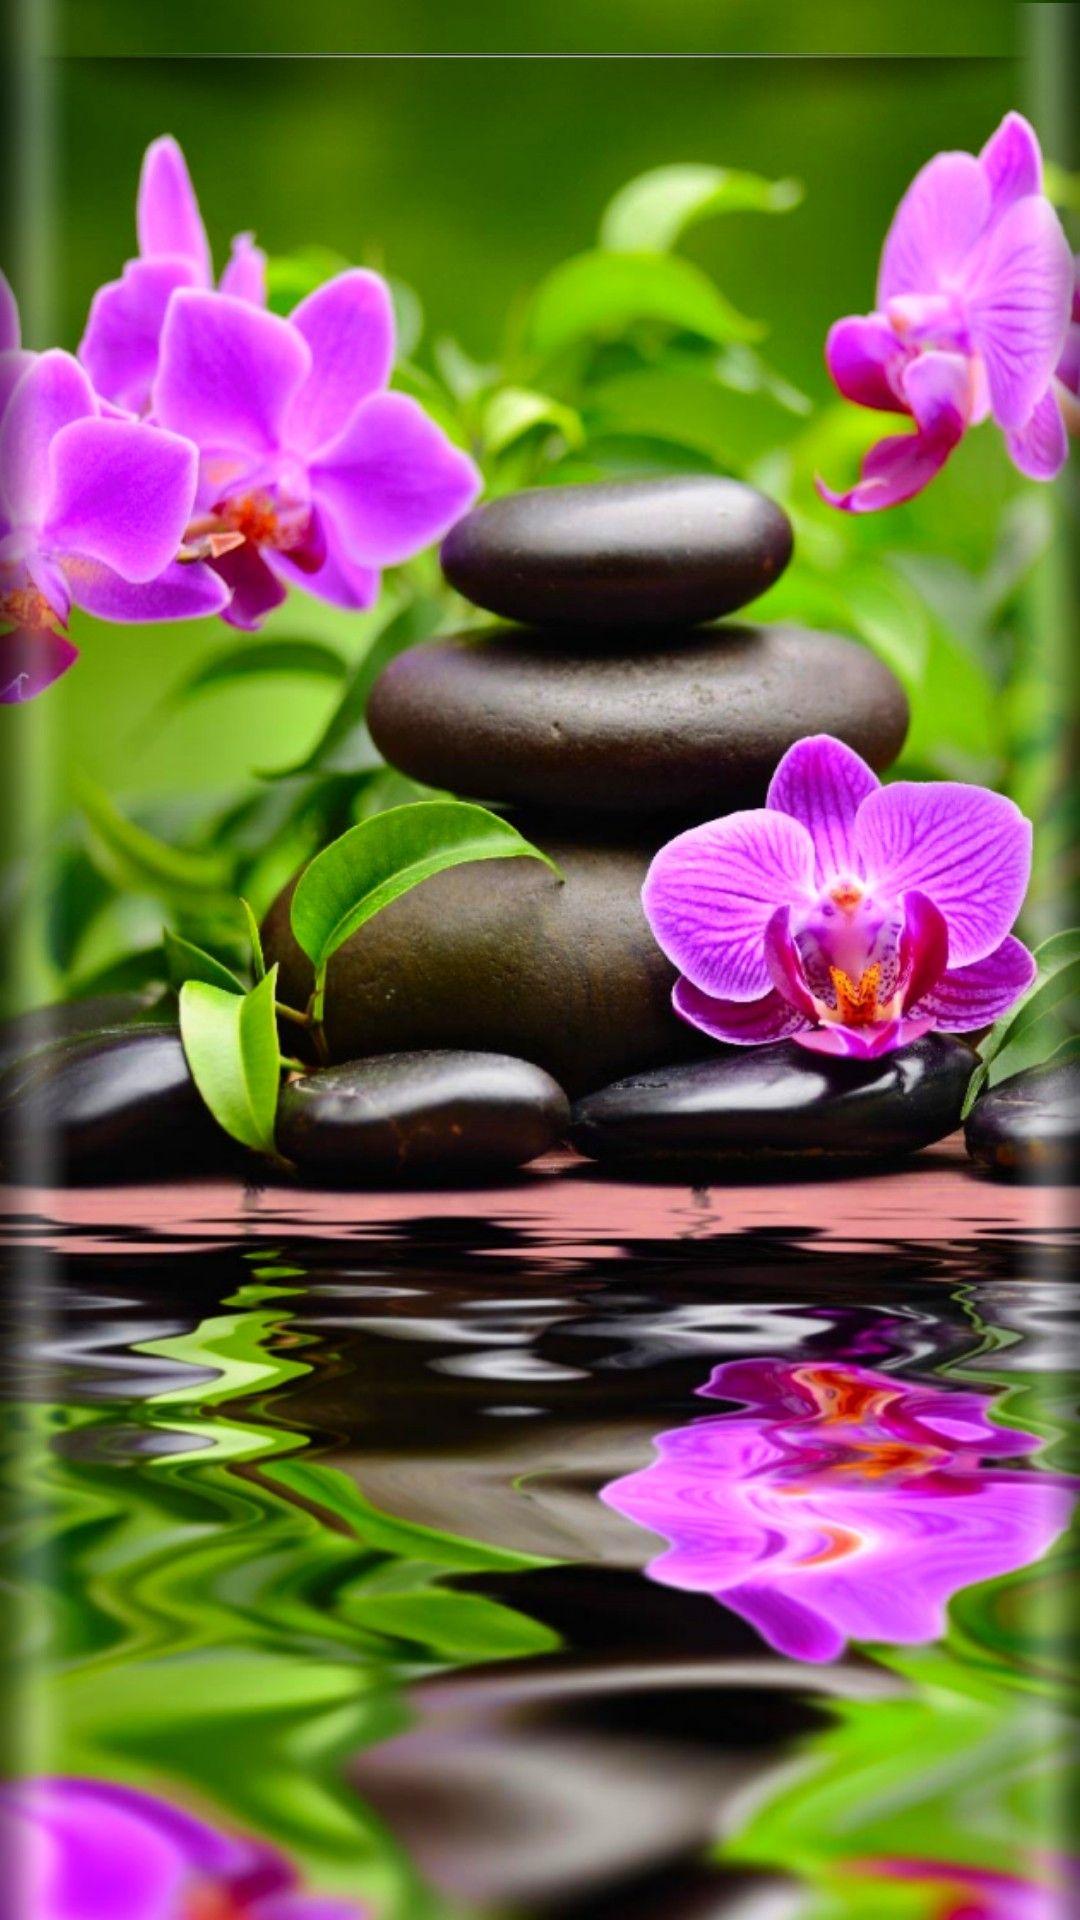 Wallpaper By Artist Unknown Zen Wallpaper Orchid Wallpaper Flower Background Wallpaper